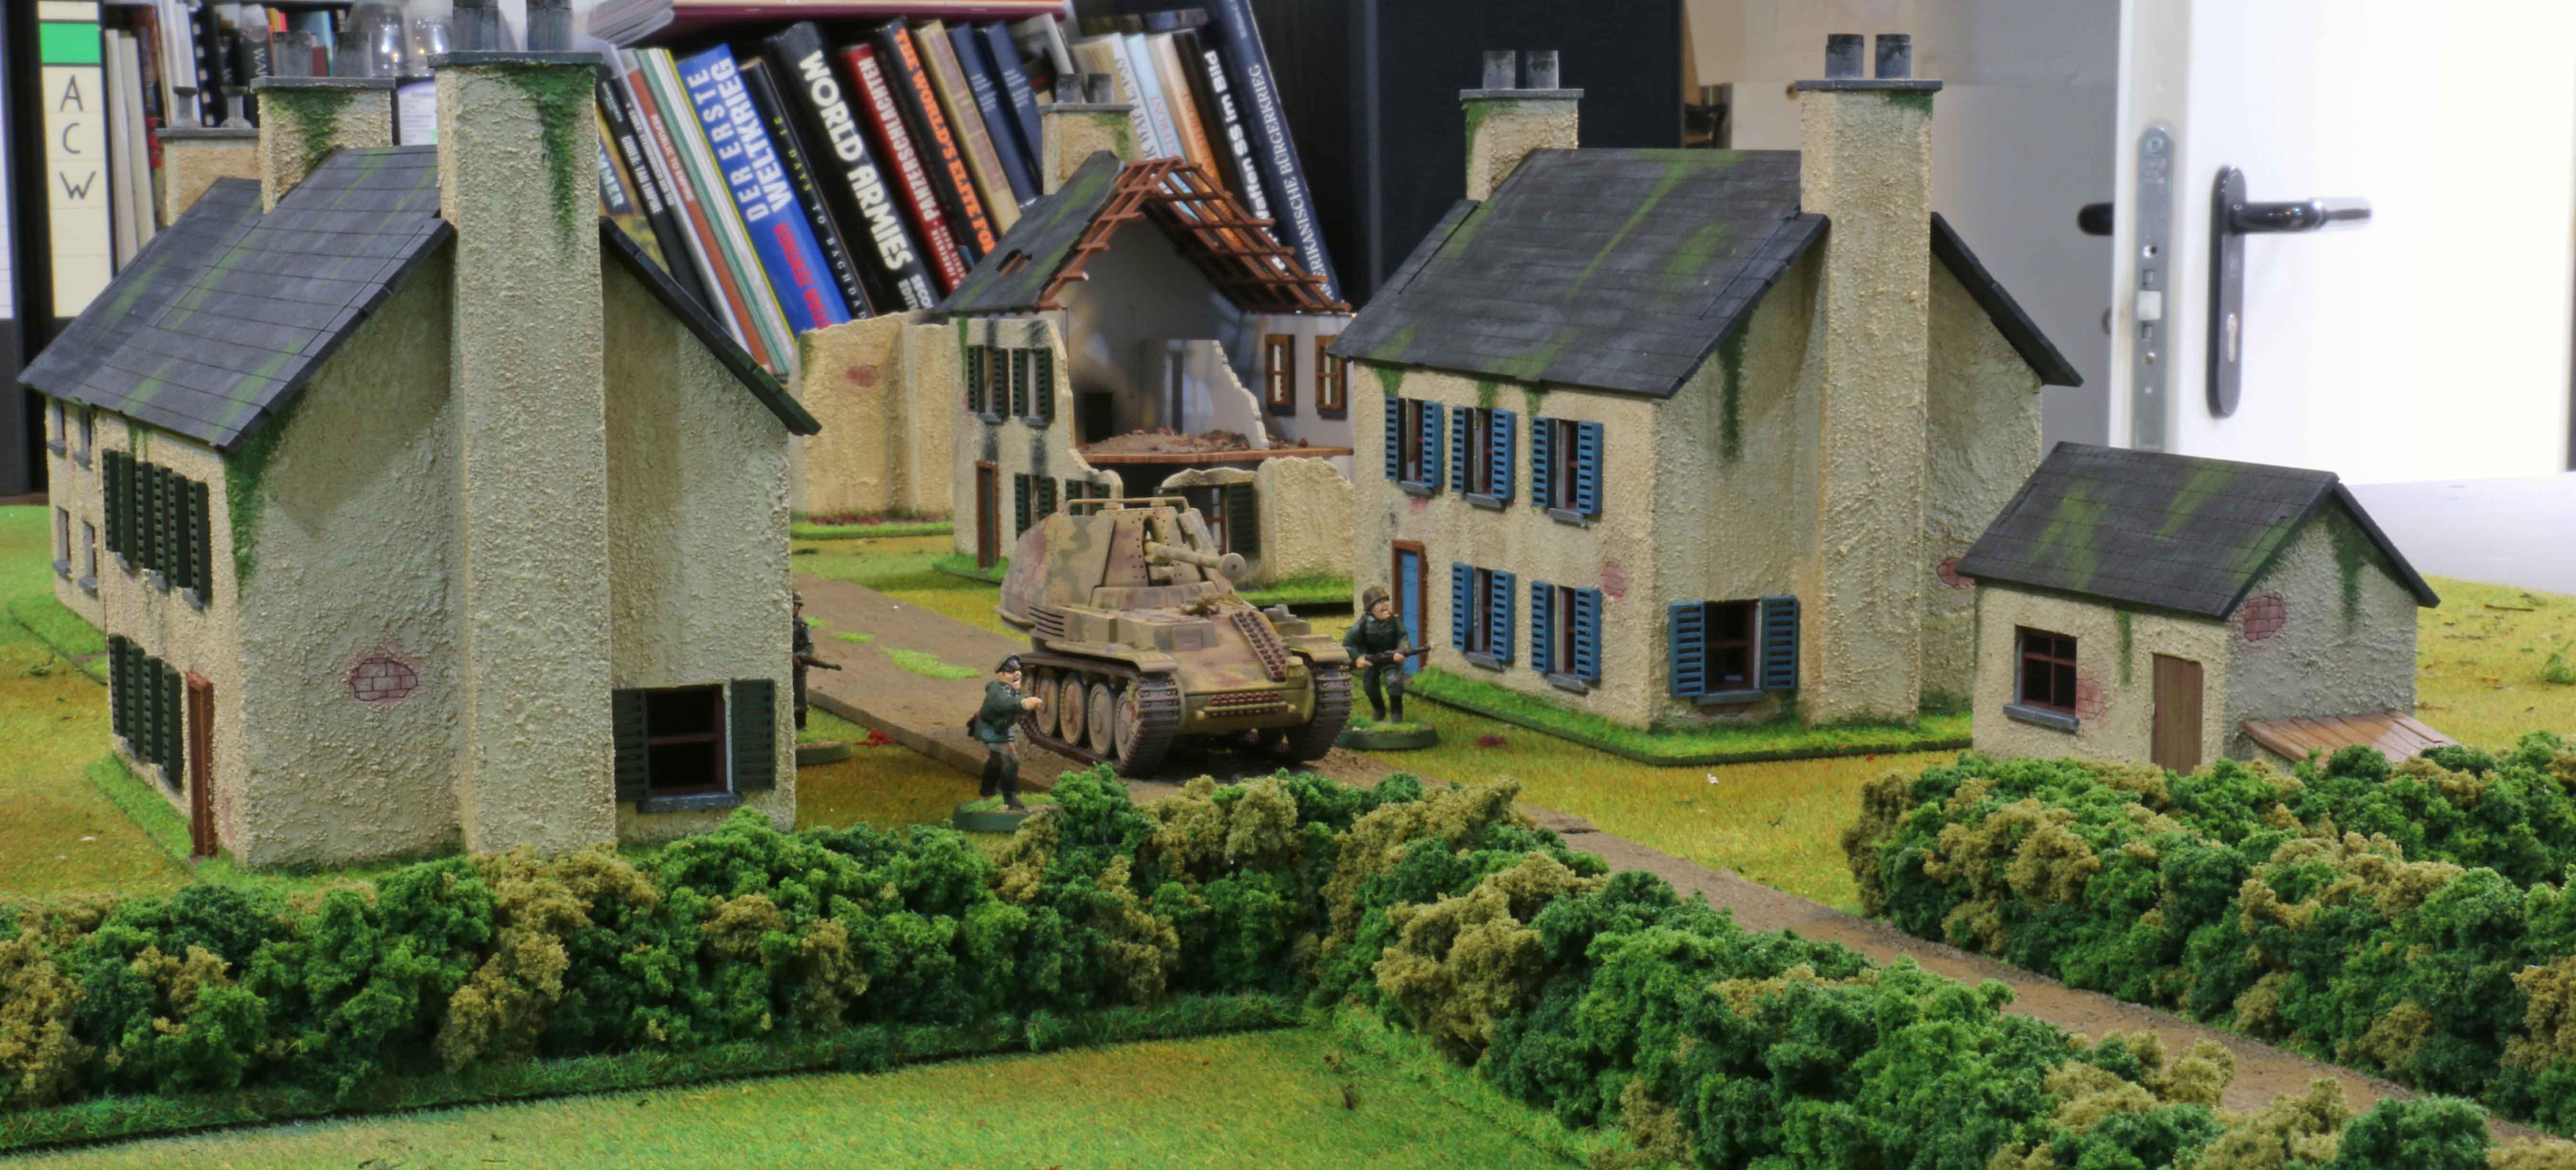 Normandy Houses Dhcwargamesblog